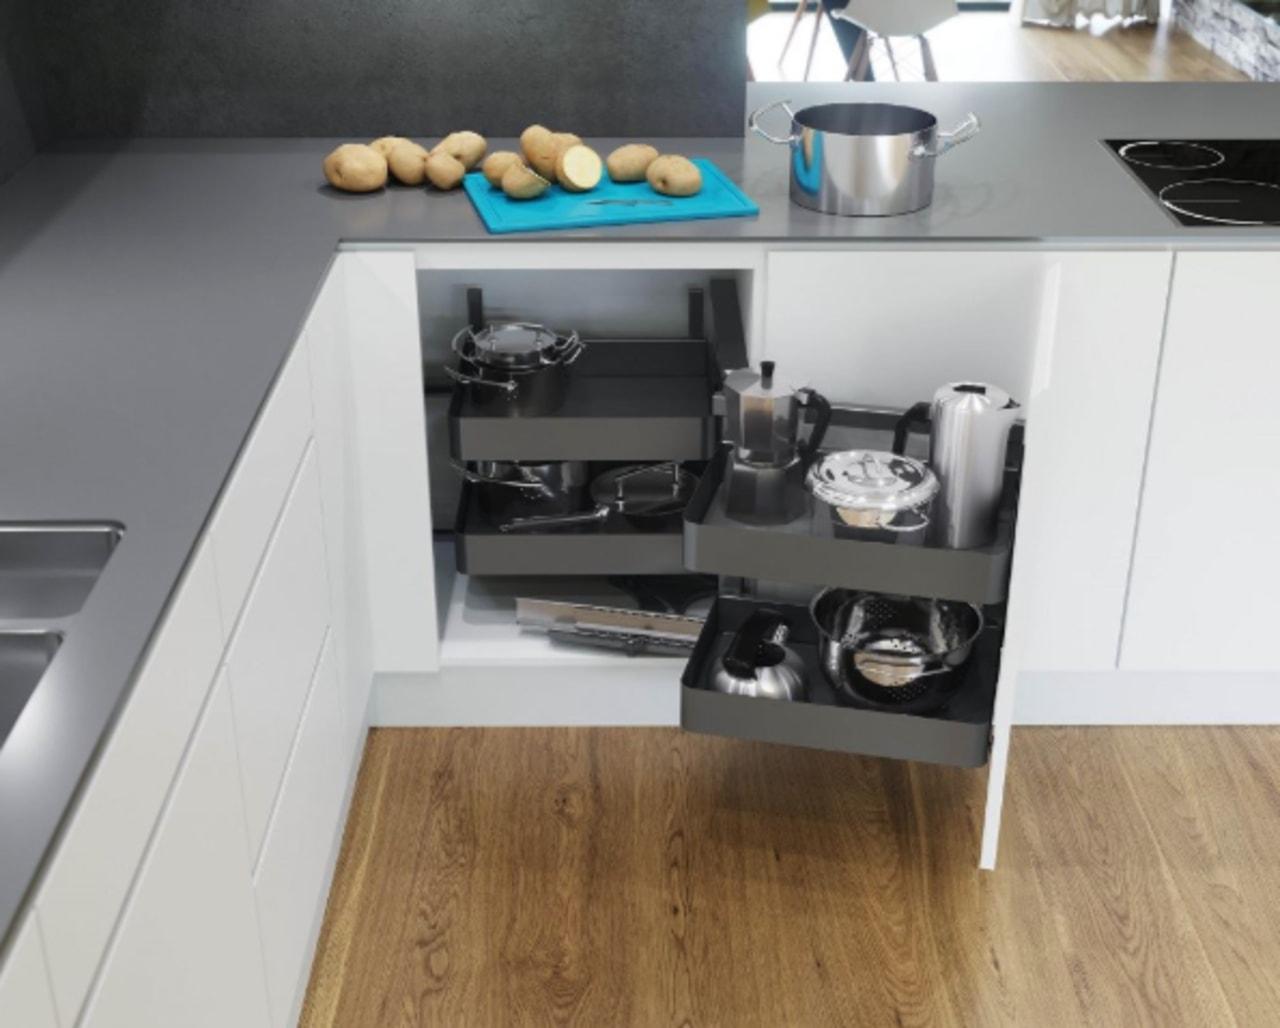 Planero Vs Cor Fold Pull Out Corner Unit countertop, drawer, floor, furniture, kitchen, table, gray, white